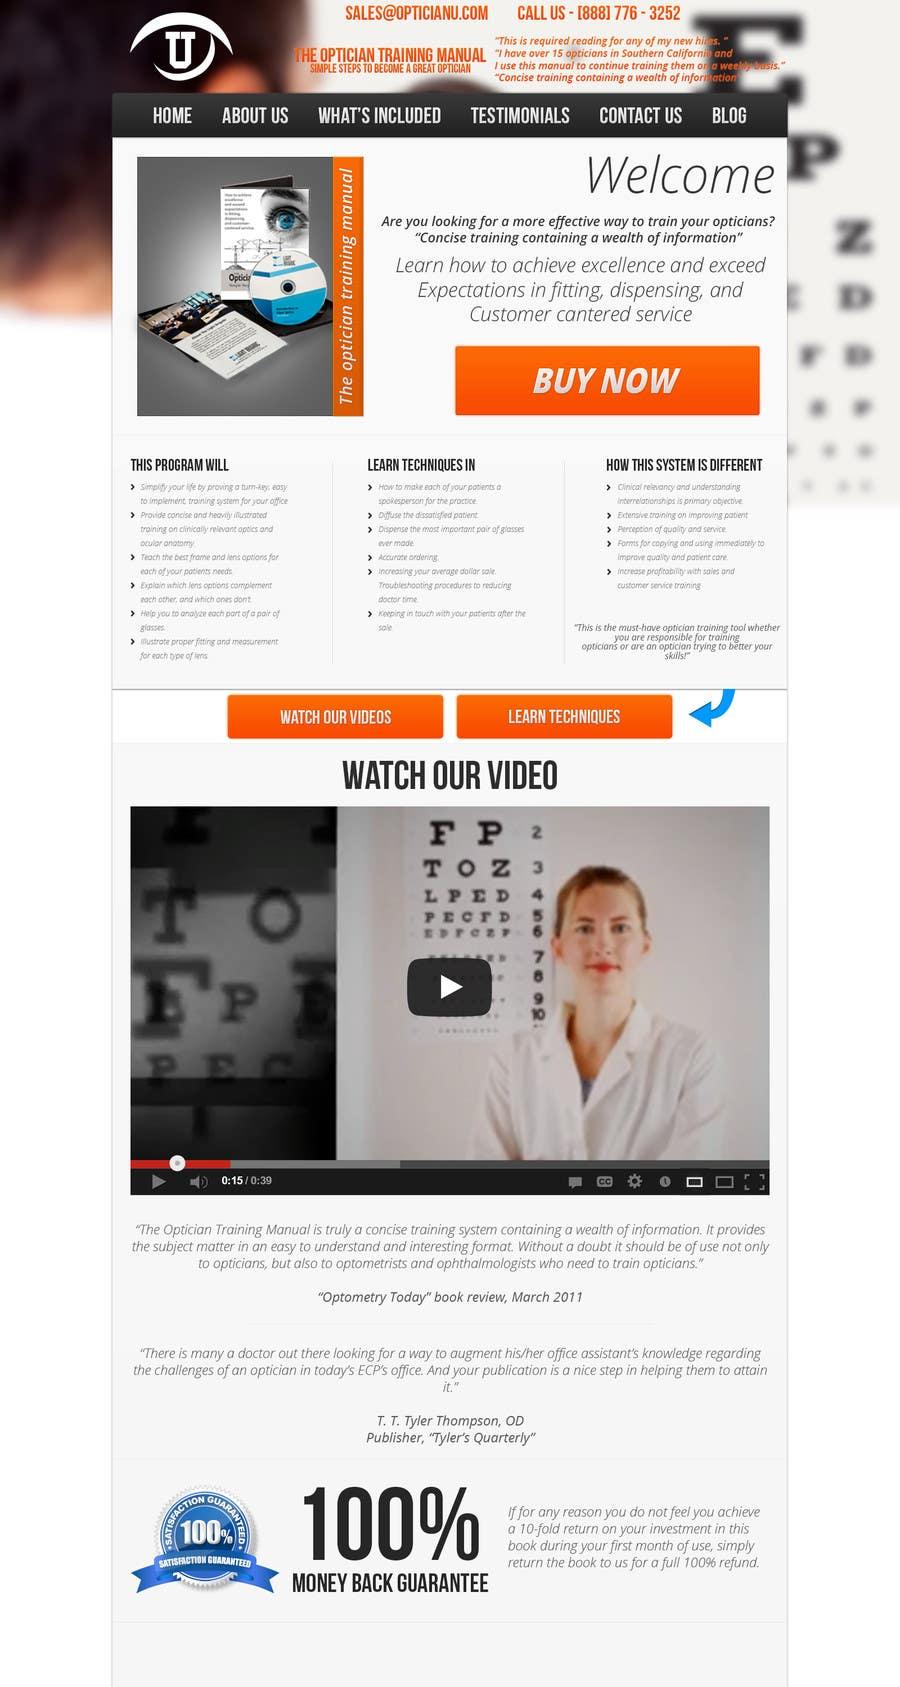 Penyertaan Peraduan #                                        9                                      untuk                                         Design a Website Mockup for www.OpticianTraining.com